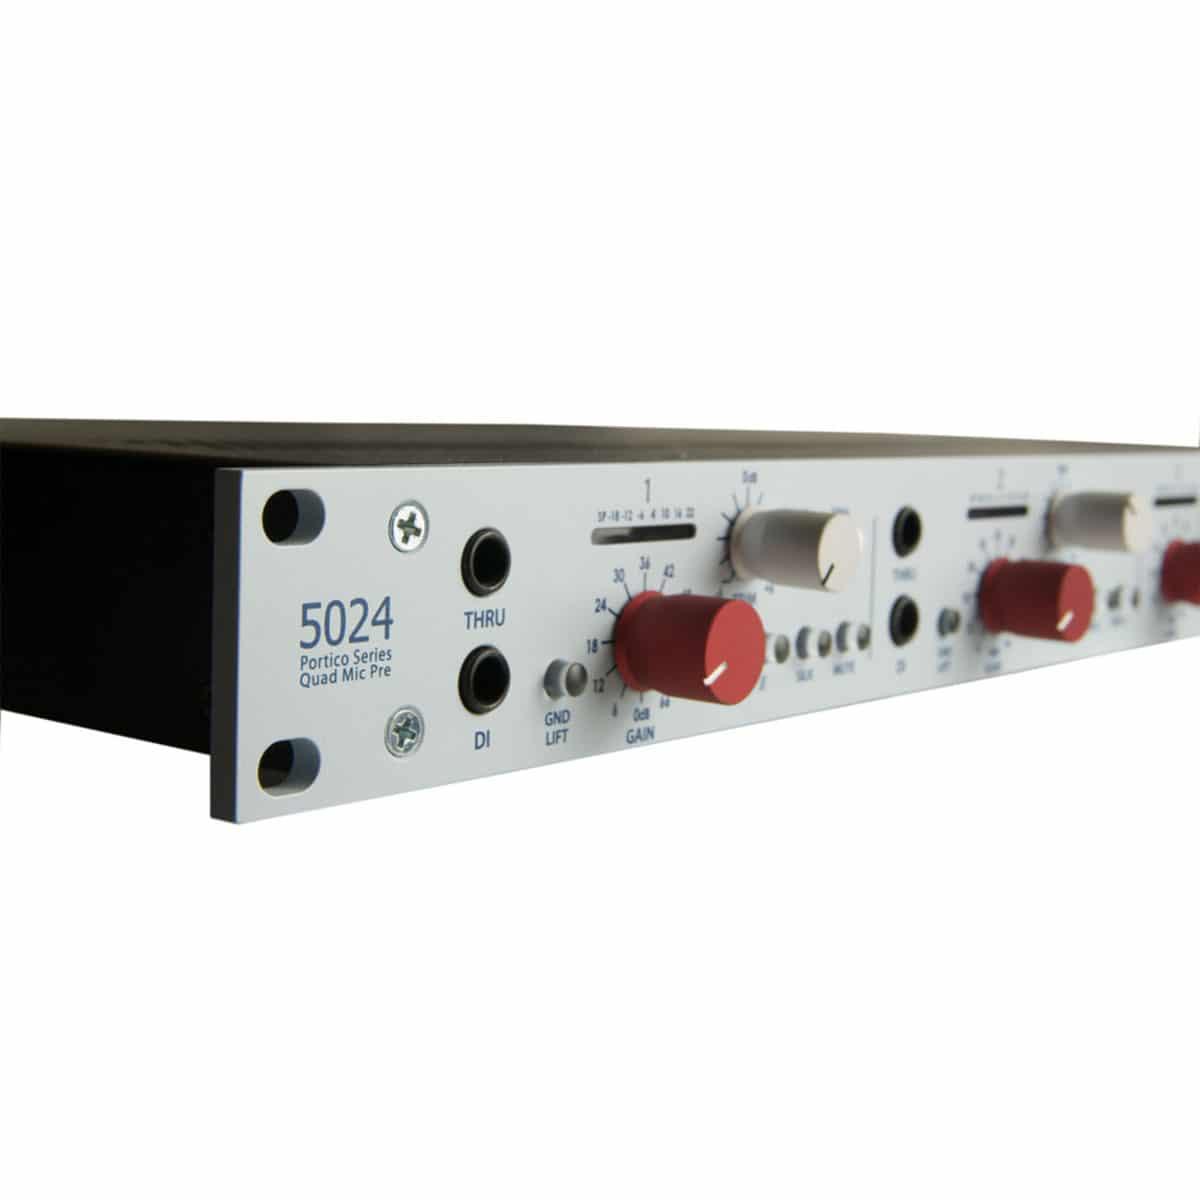 Rupwert Neve 5024 Quad Mic Pre 02 Pro Audio, Outboard, Preamplificatori Microfonici